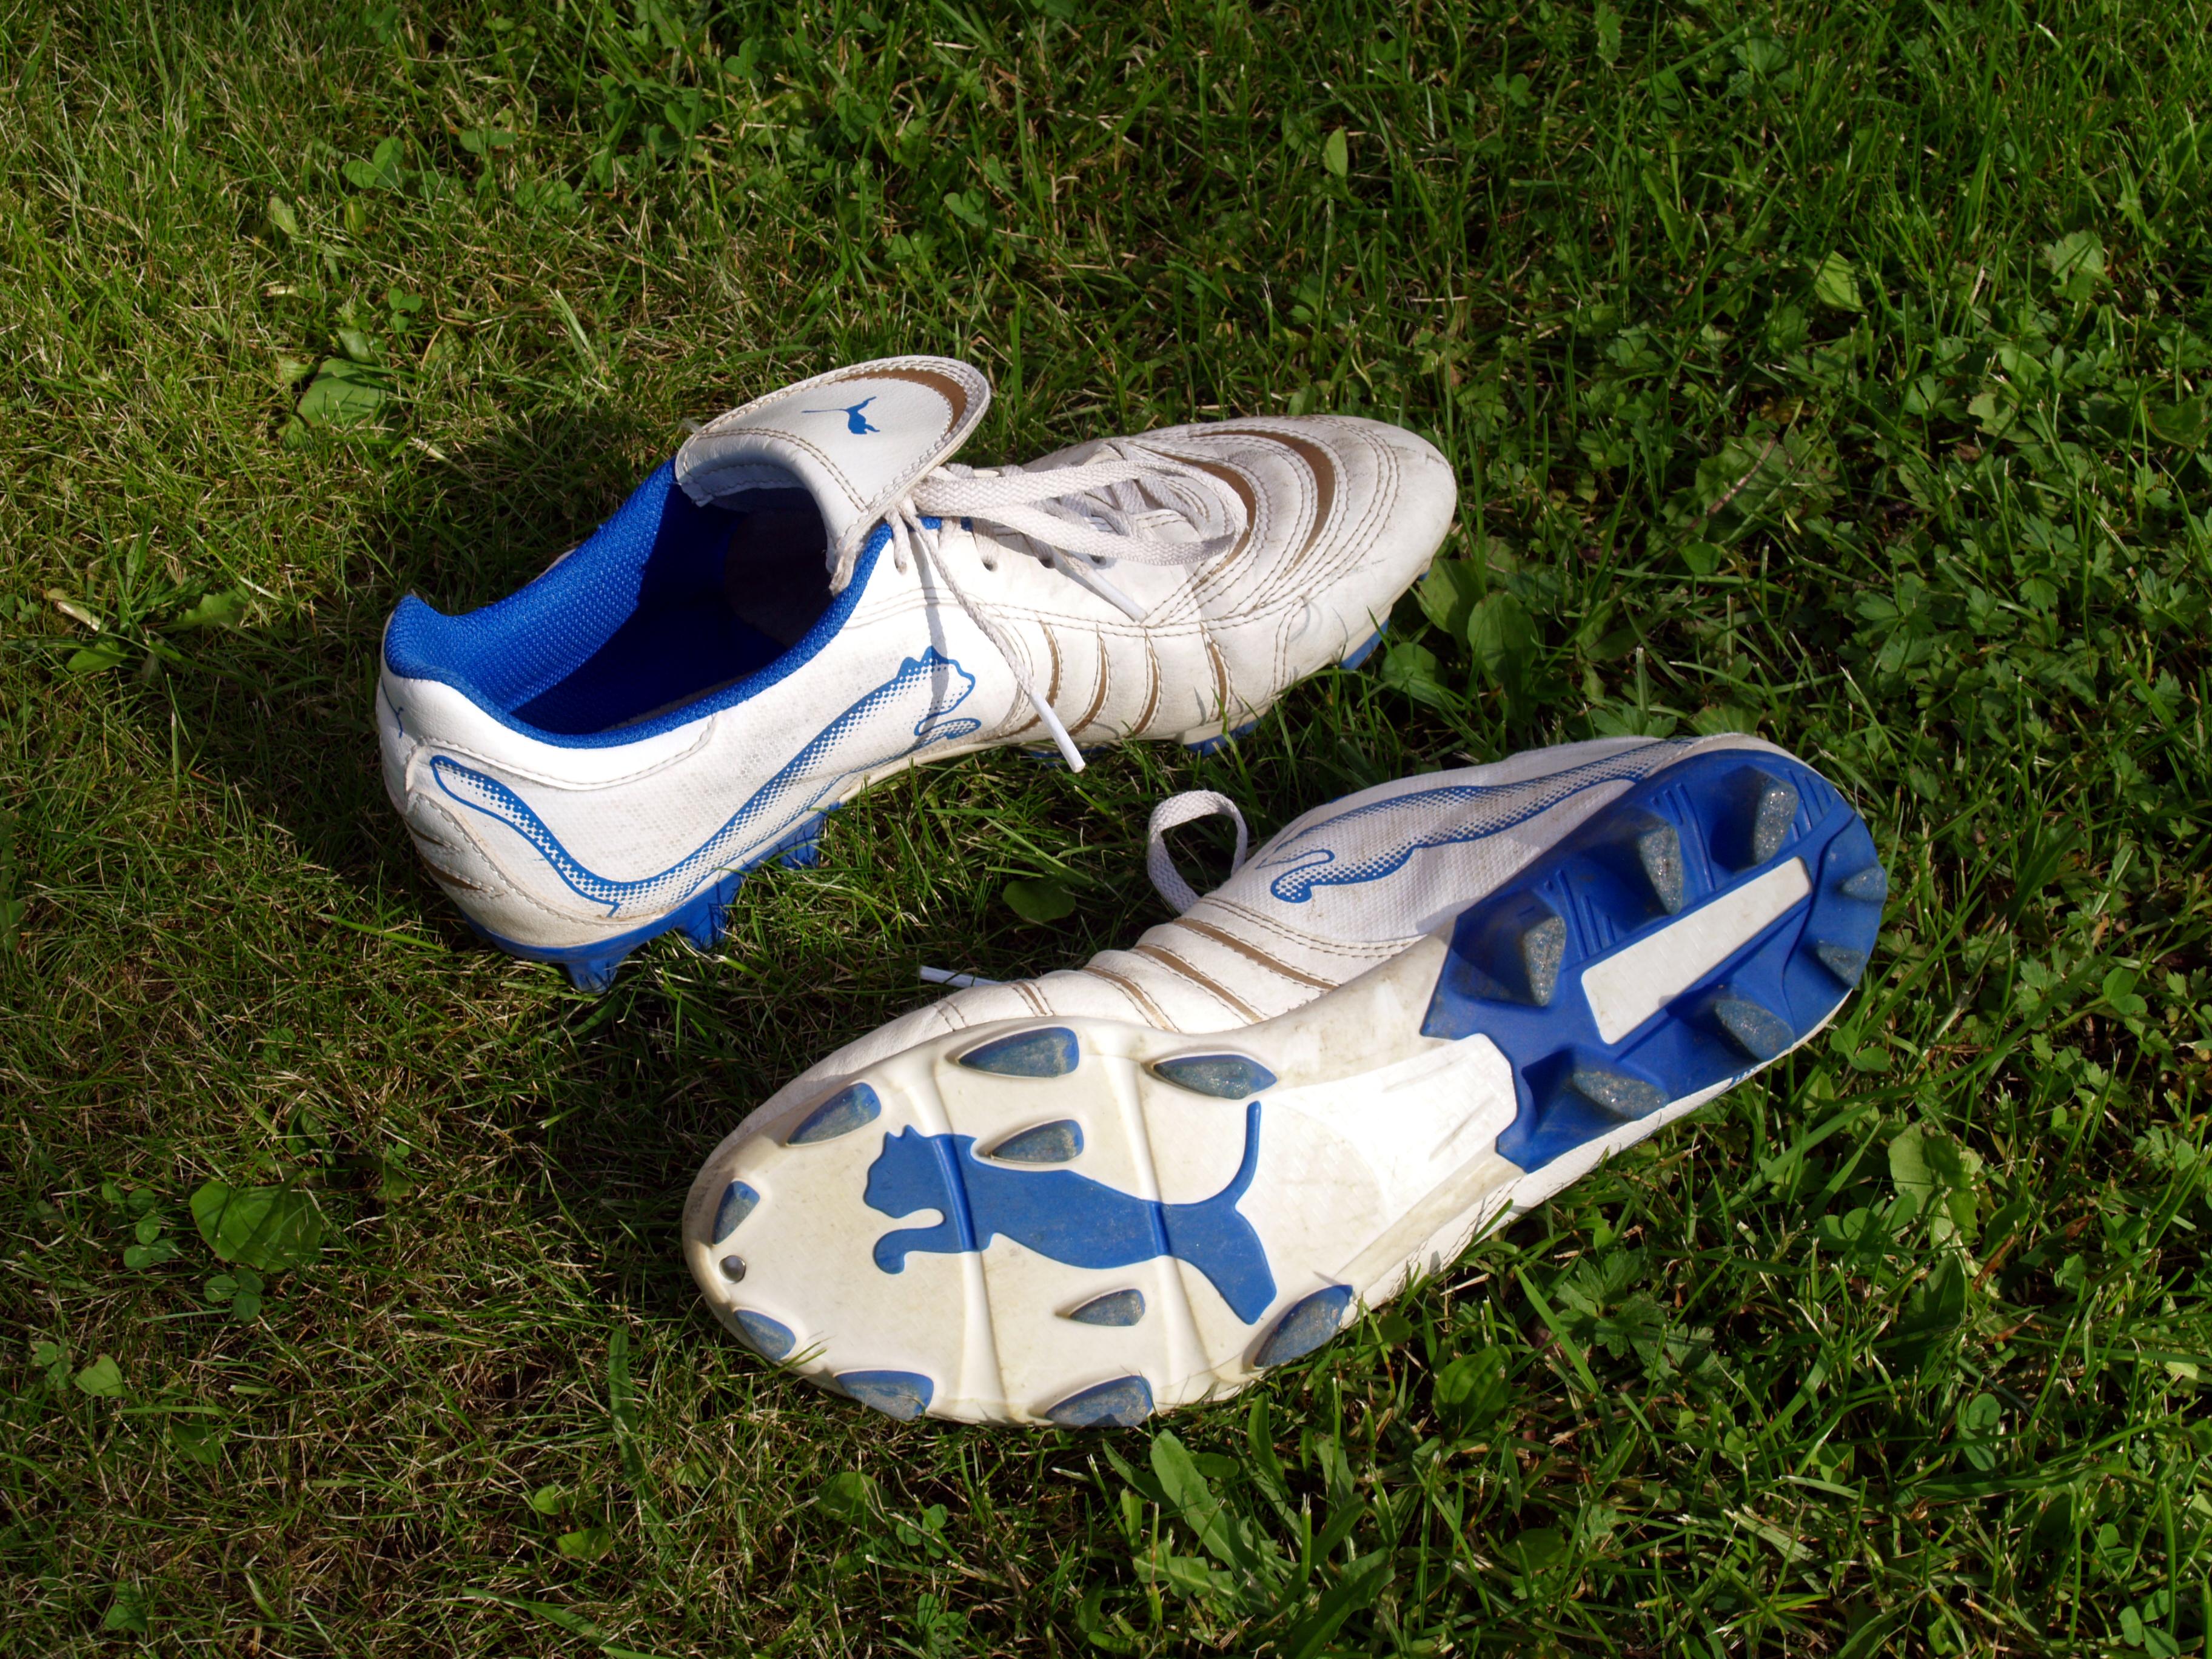 File:Puma association football shoes.jpg Wikimedia Commons